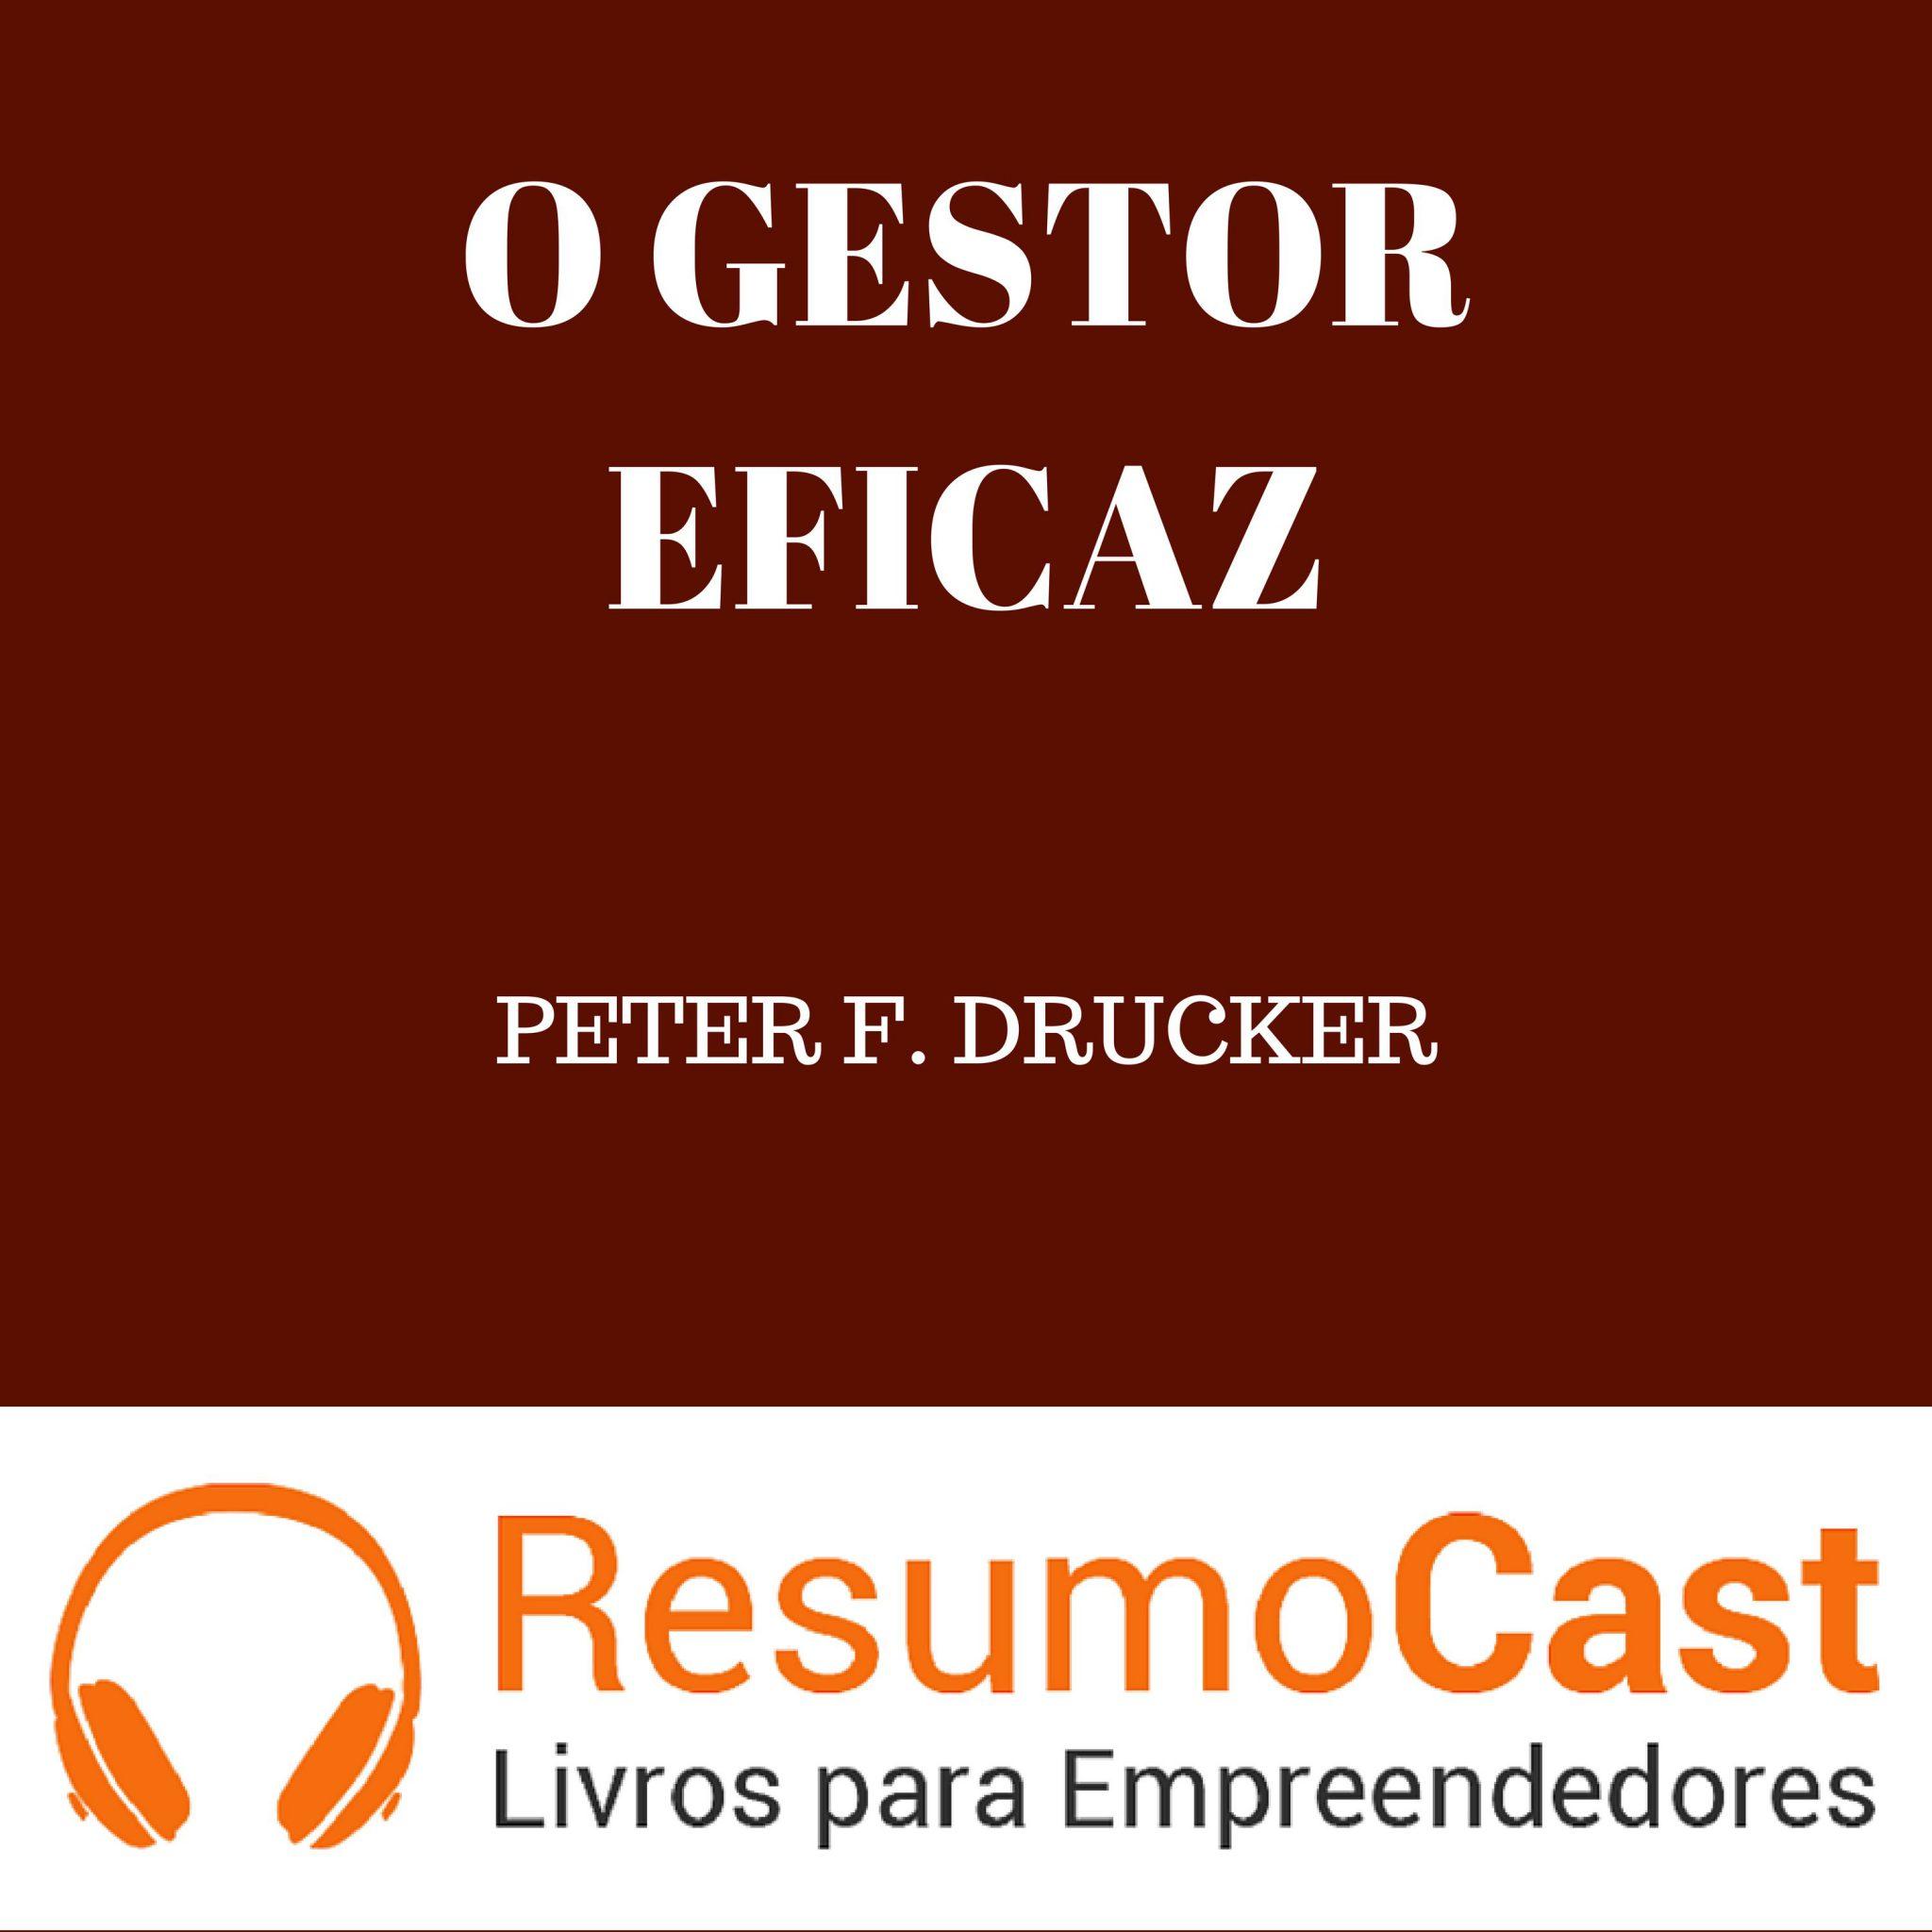 O Gestor Eficaz – Peter F. Drucker | T1#108